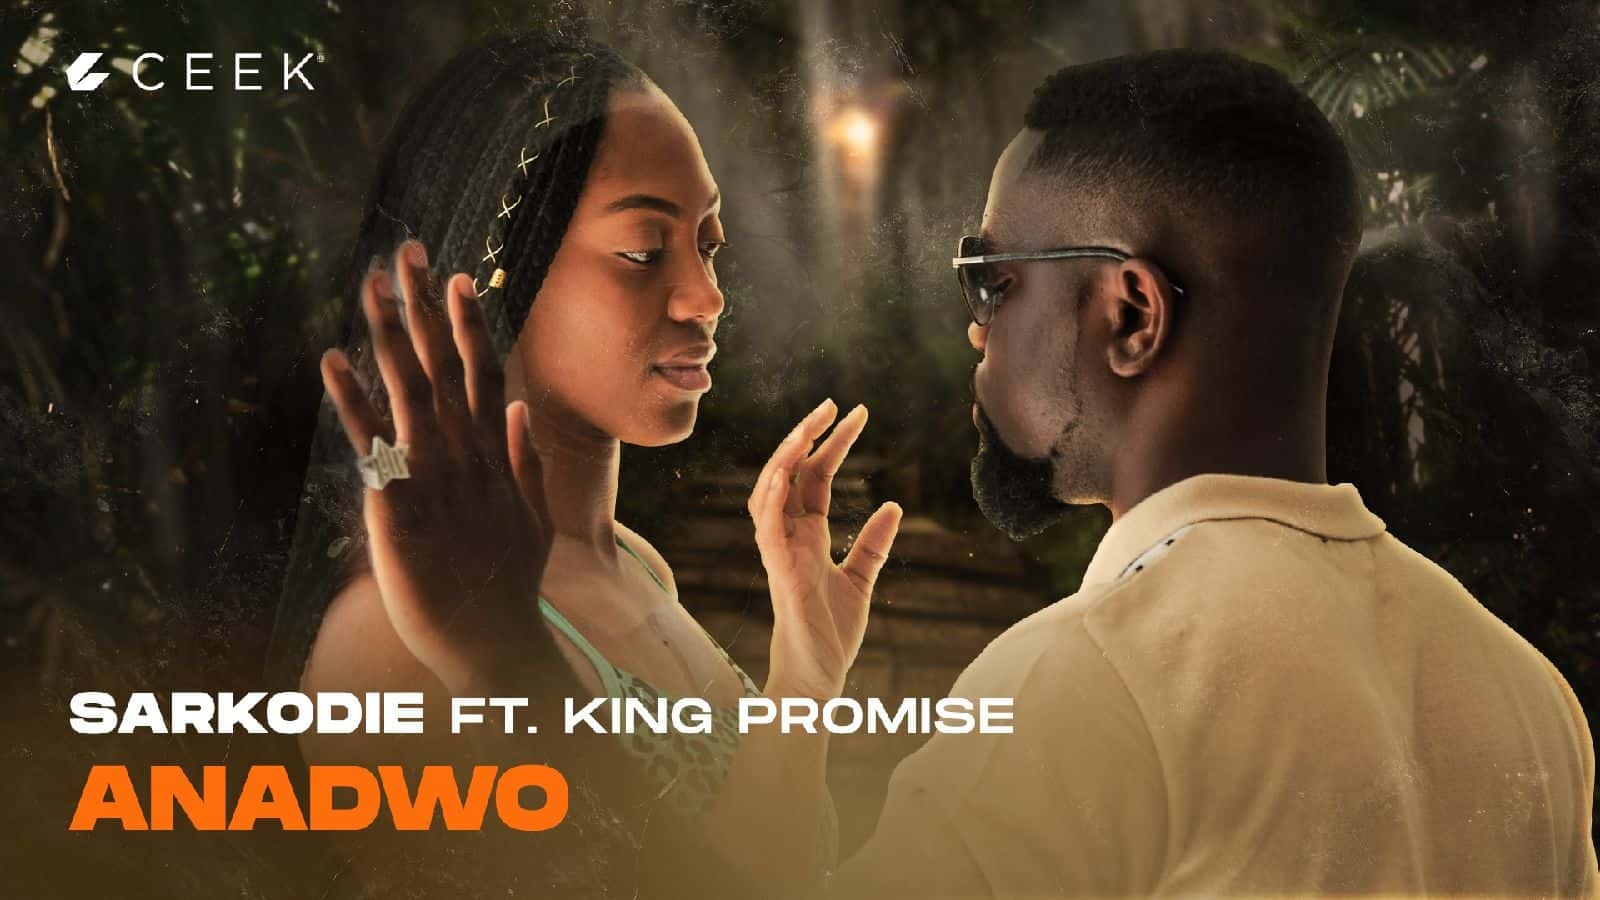 Sarkodie ft King Promise – Anadwo ceek.com